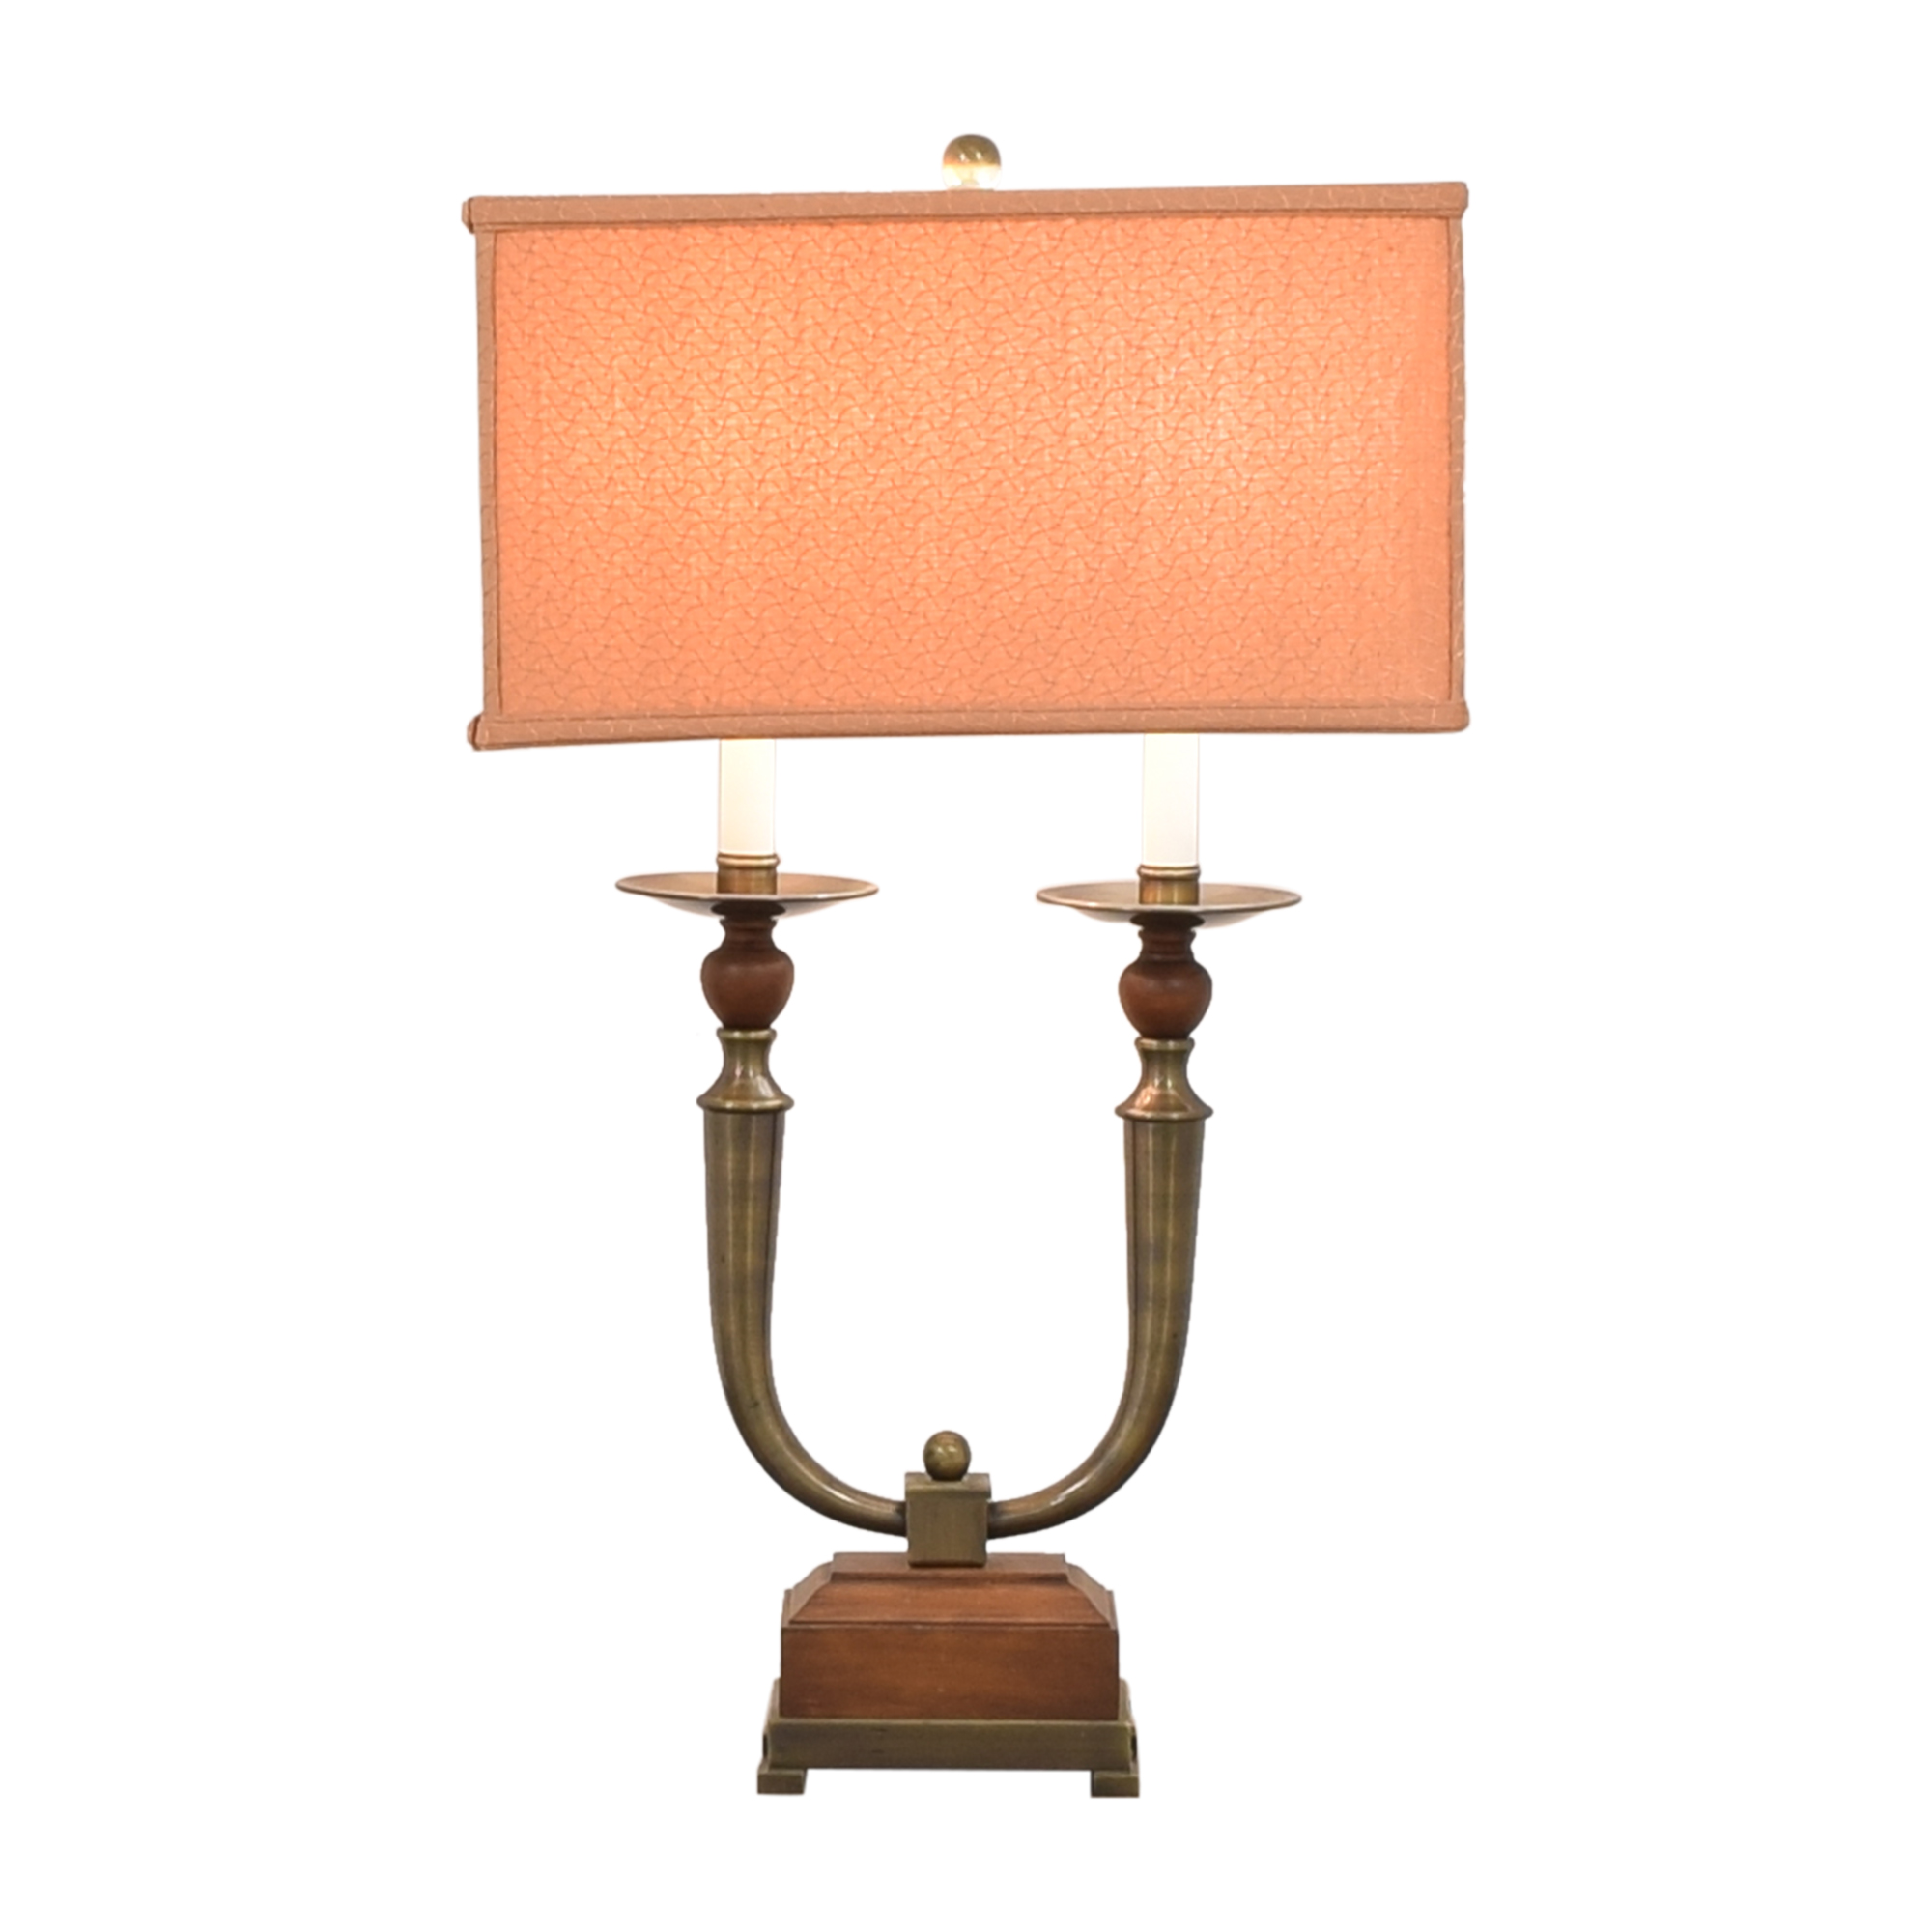 Neiman Marcus Neiman Marcus Table Lamp on sale